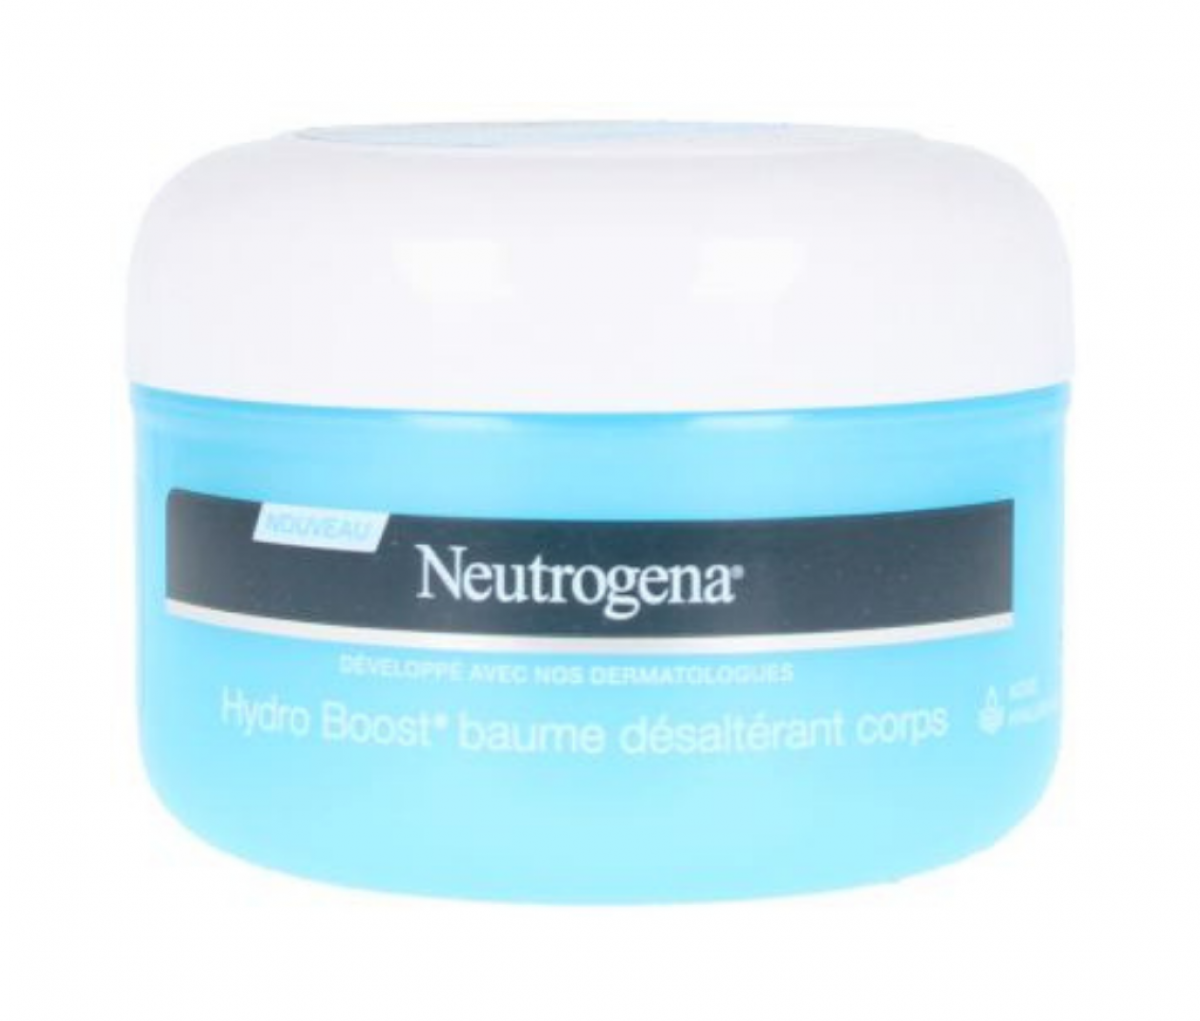 Neutrogena 200ml Hydro Boost Corps Cream